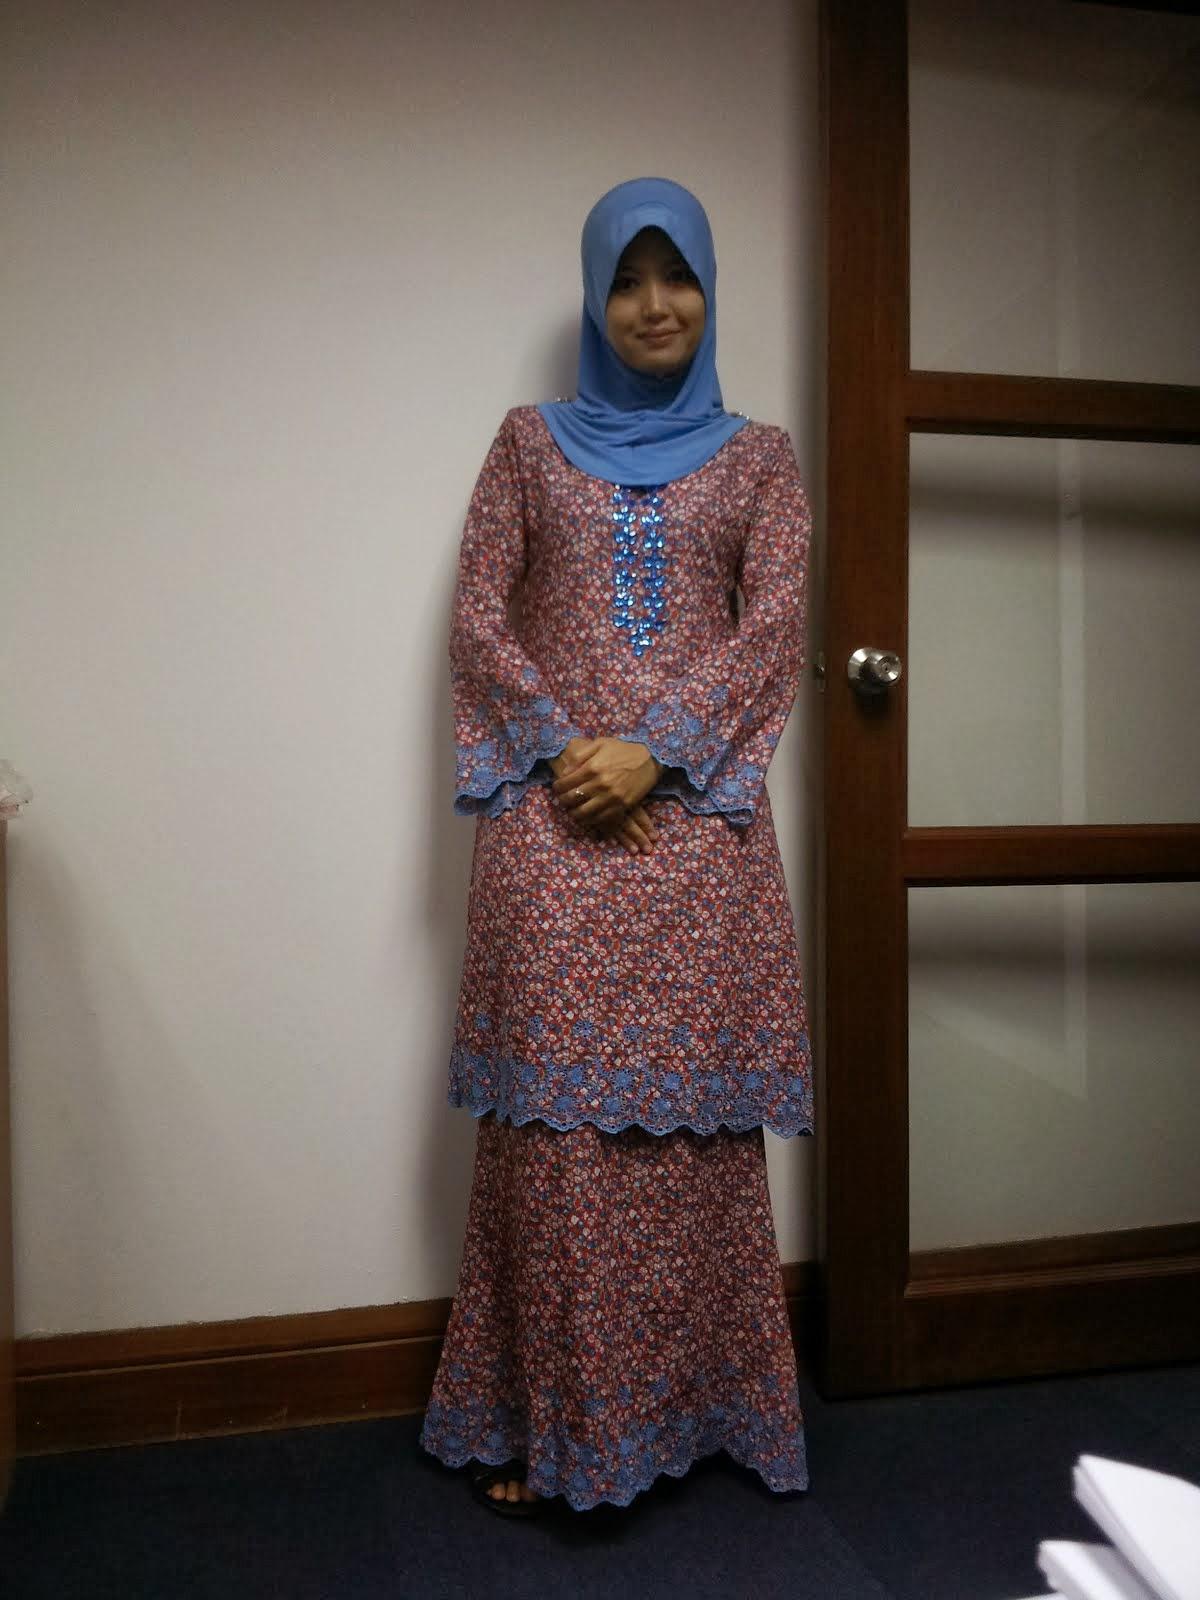 Sahliza Binti Haji Jani @ Hj Abdul Halim